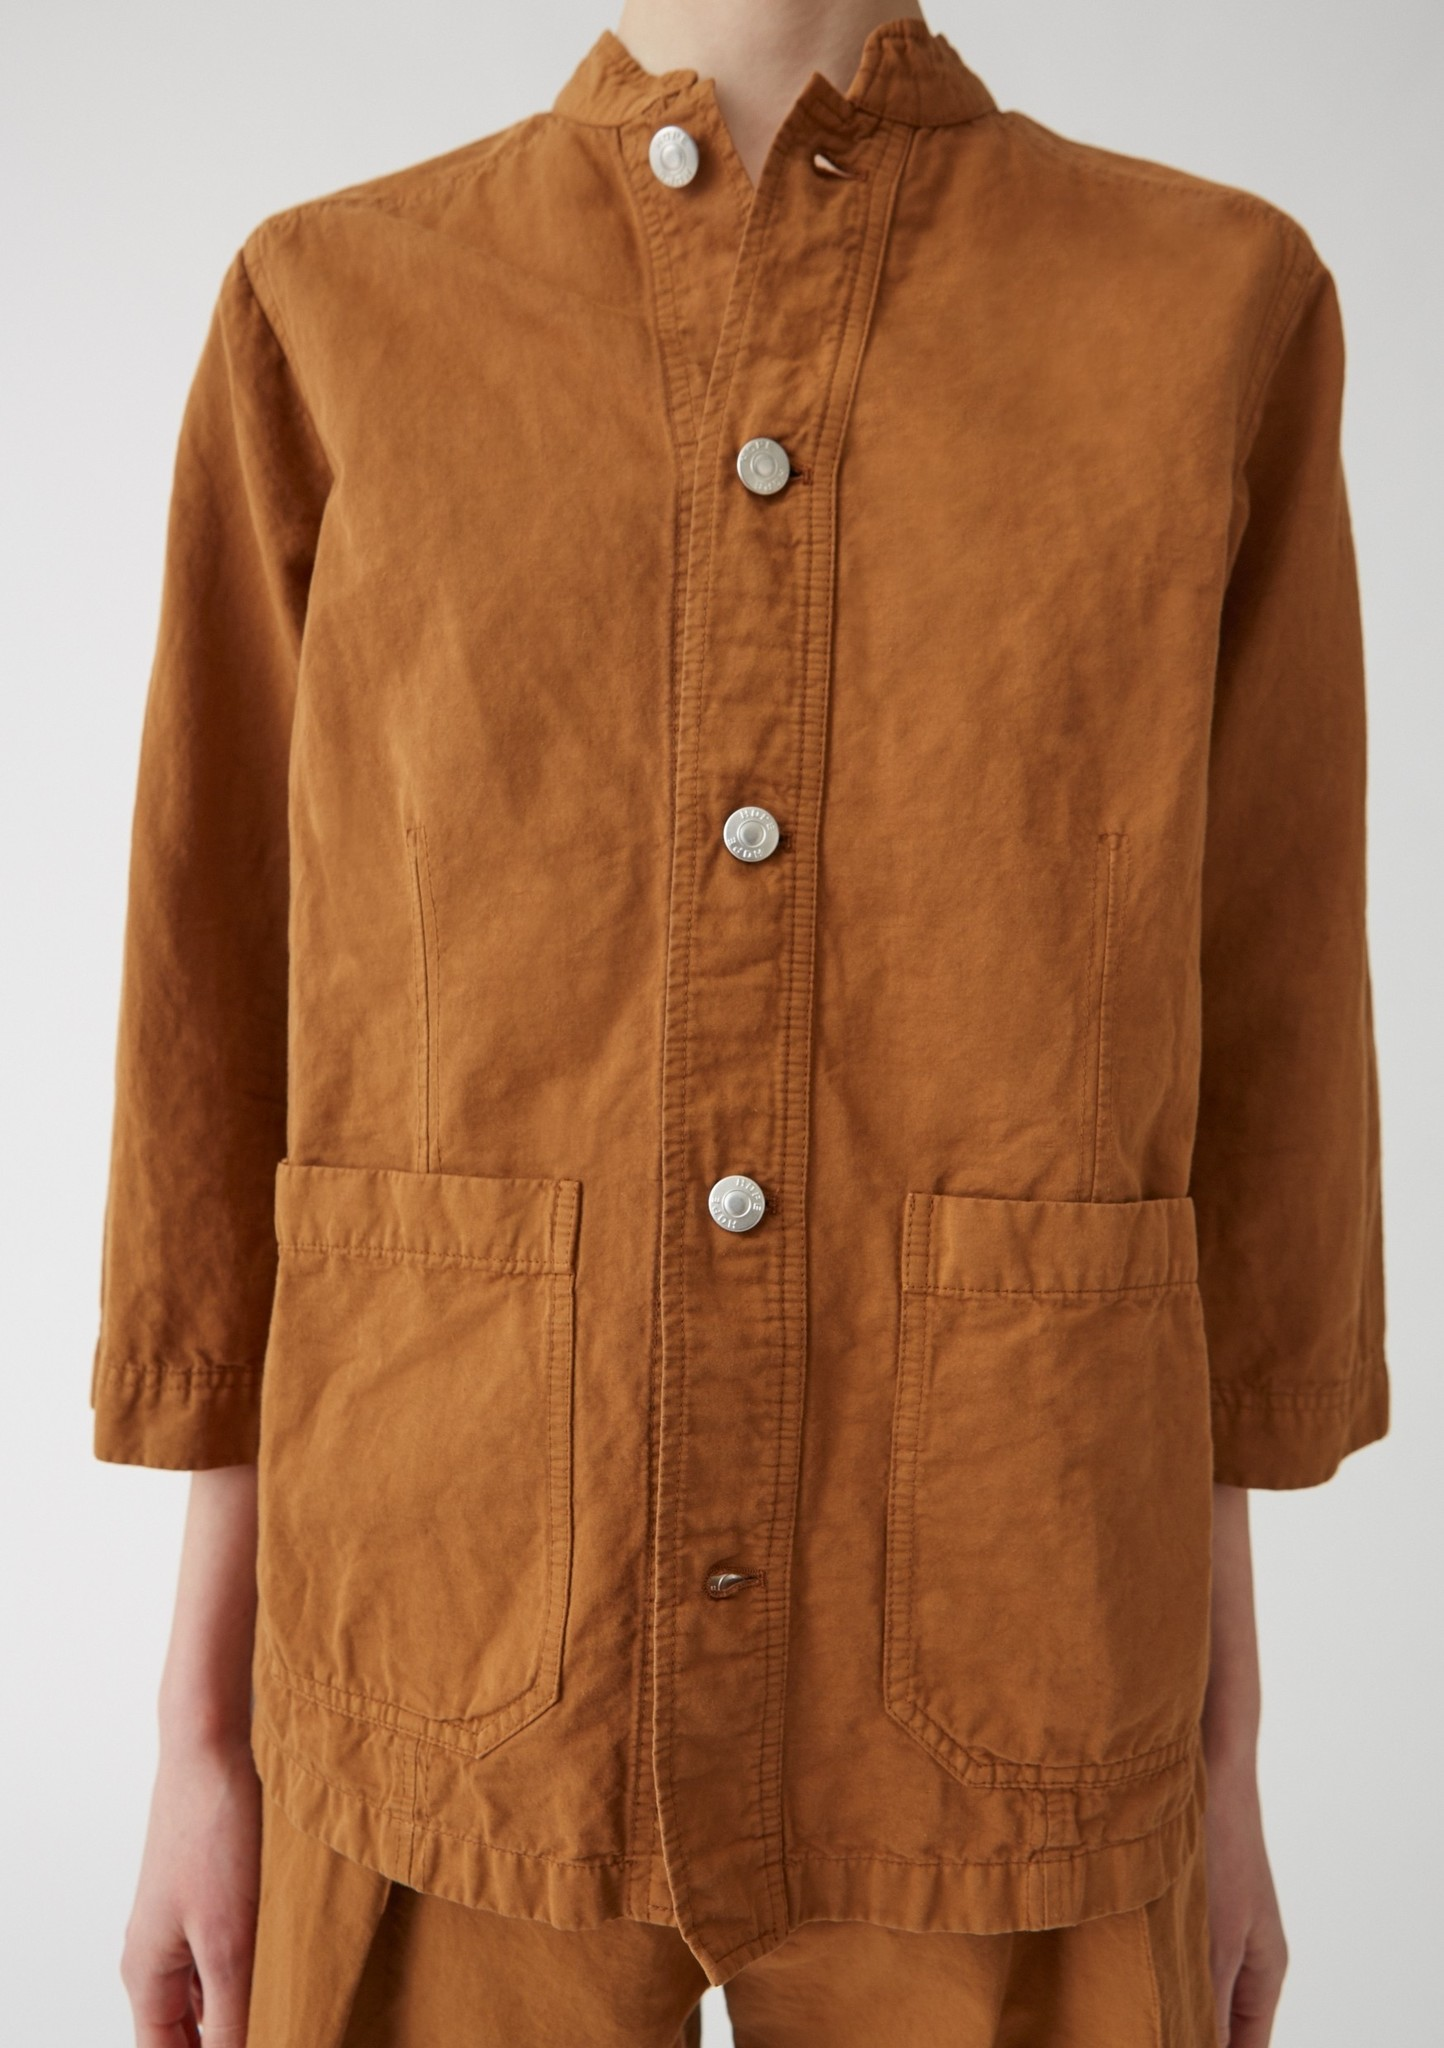 Escape work jacket clay brown